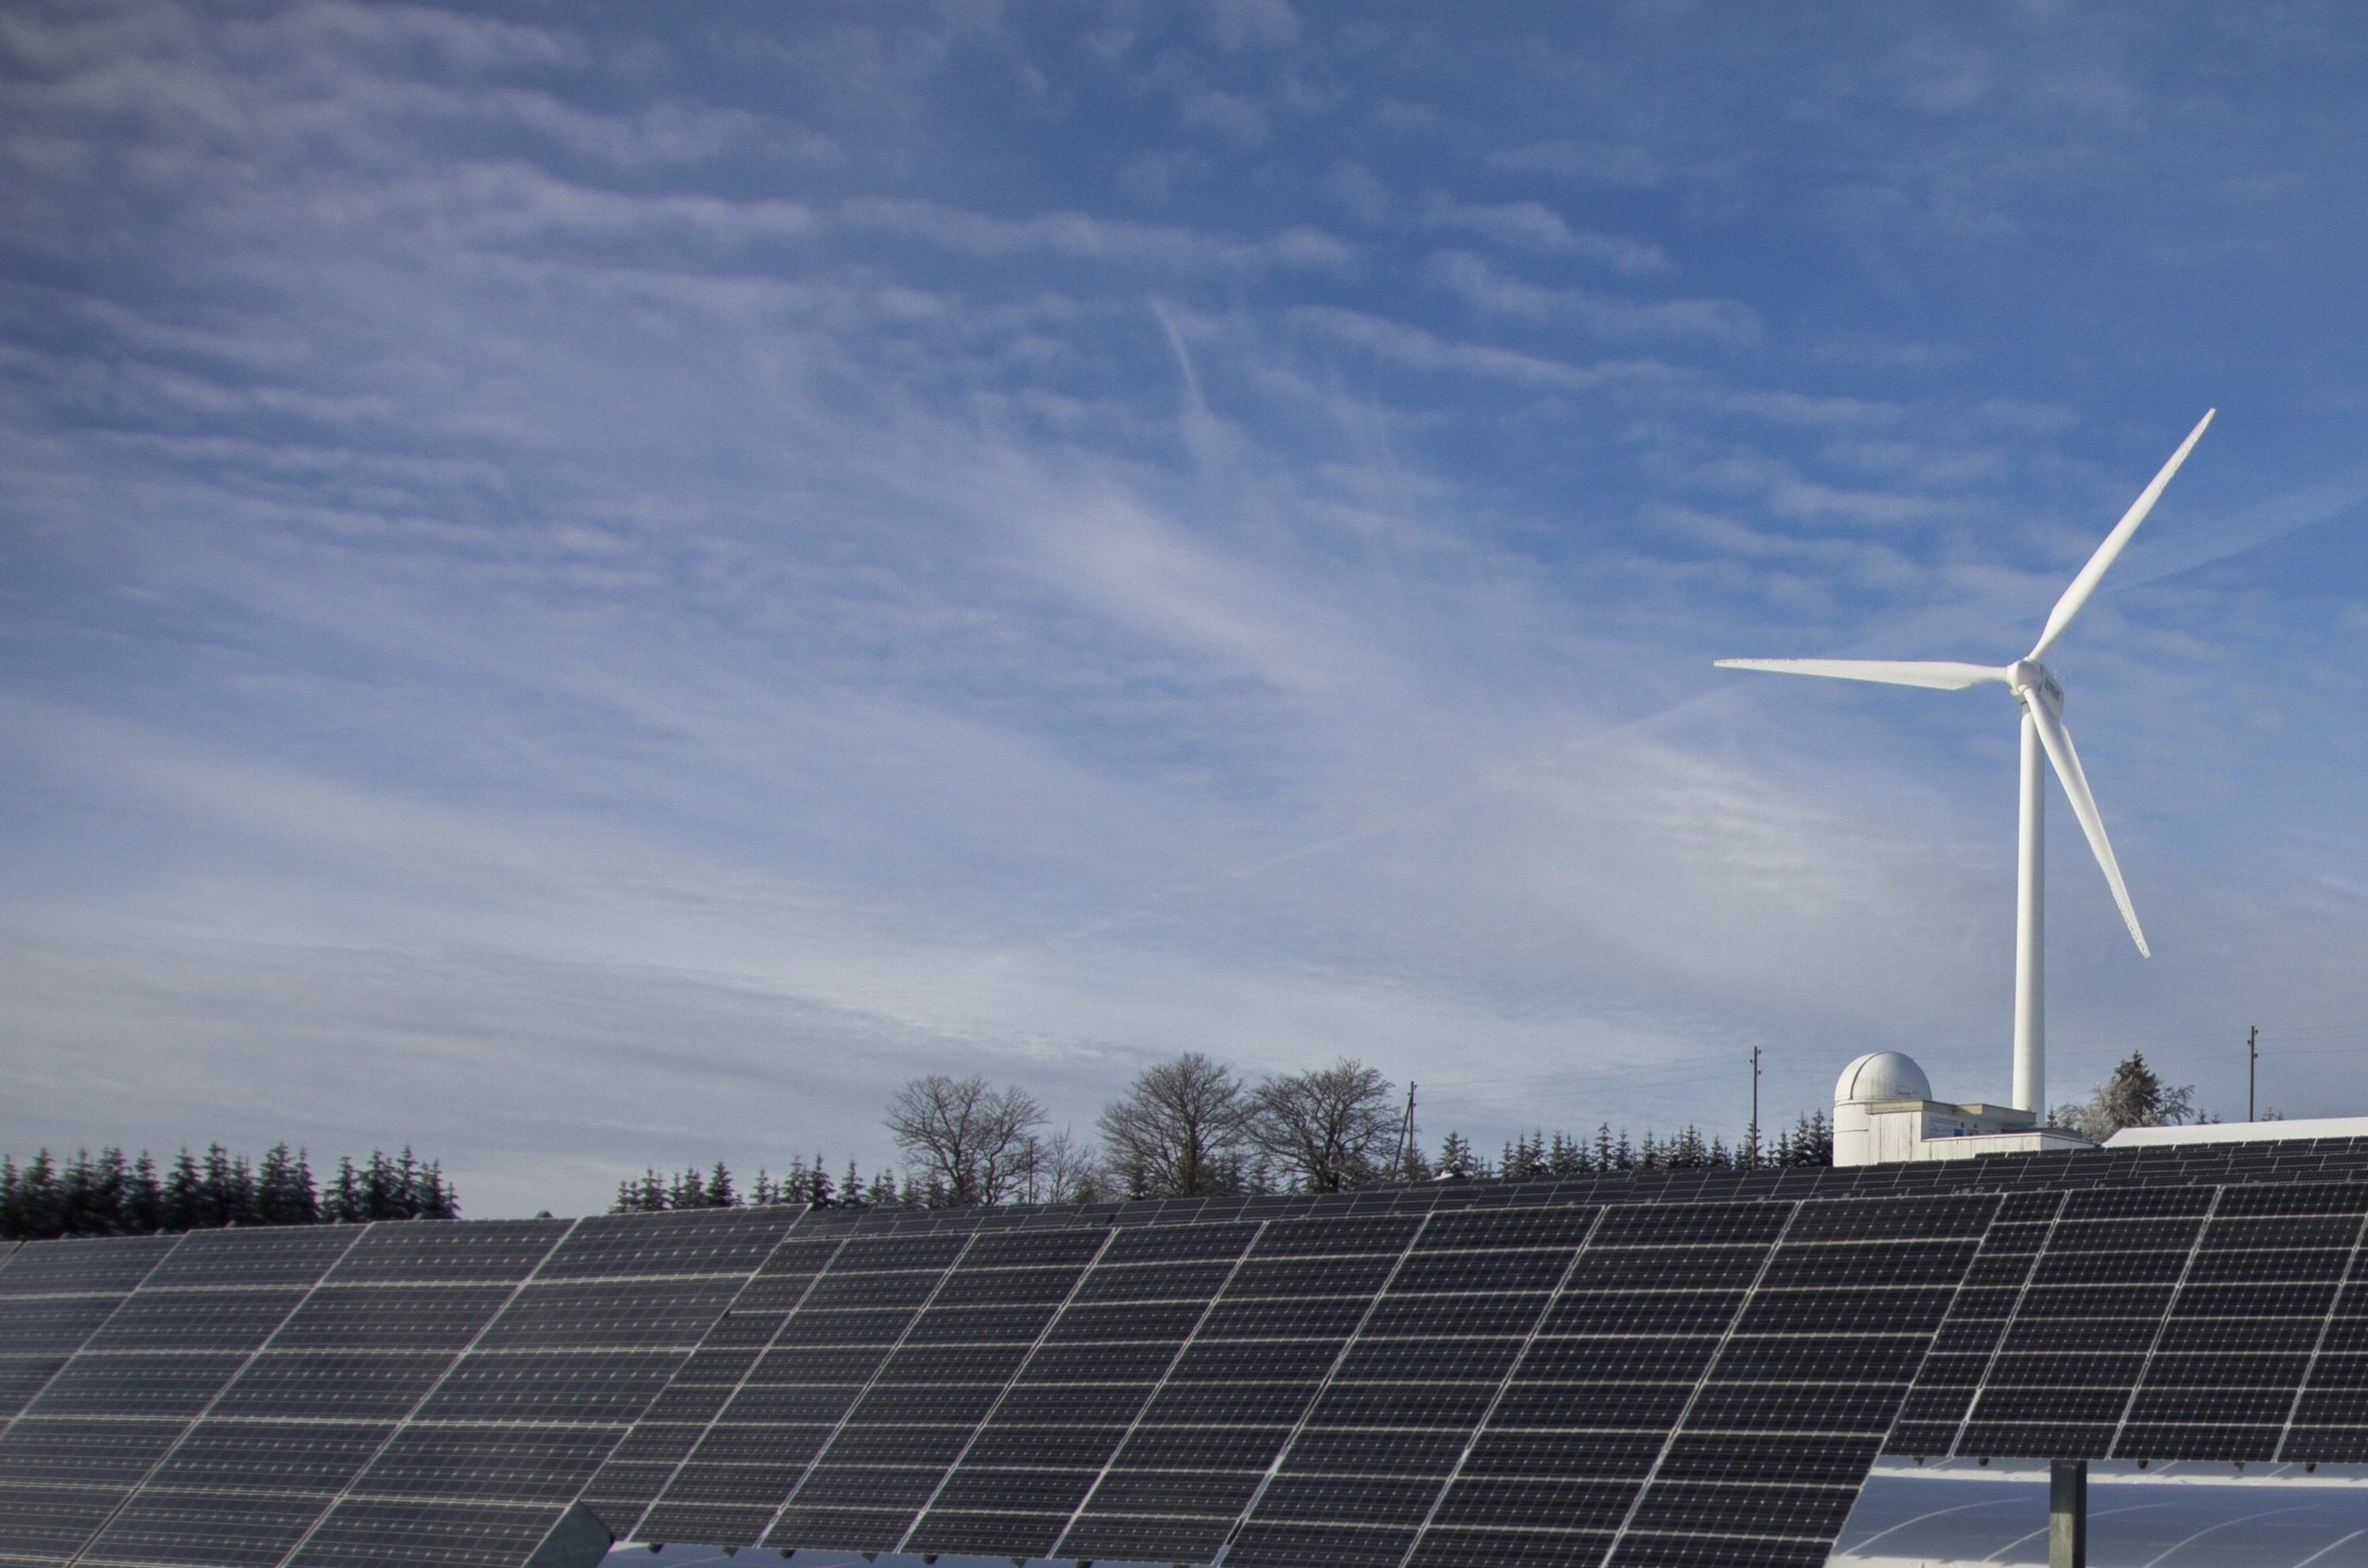 Estudo de viabilidade logística e impacto fiscal - Planta fotovoltaica - Fotovatio